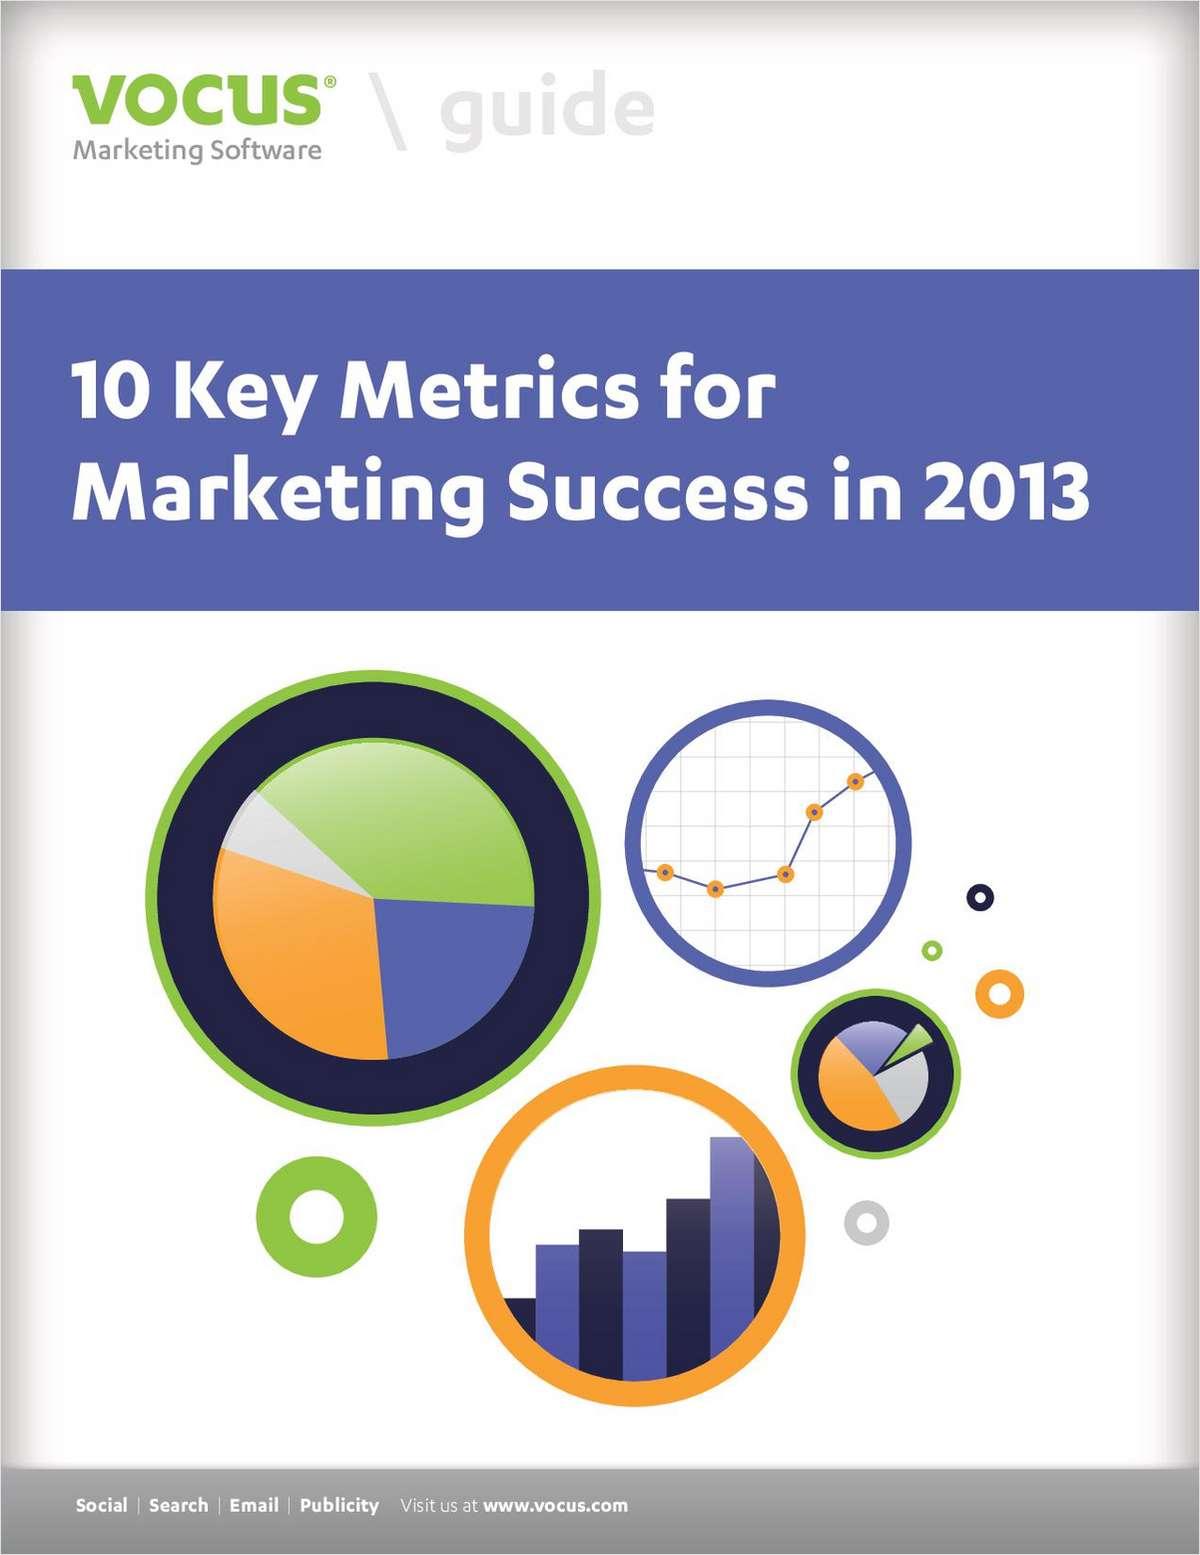 10 Metrics for 2013 Marketing Success